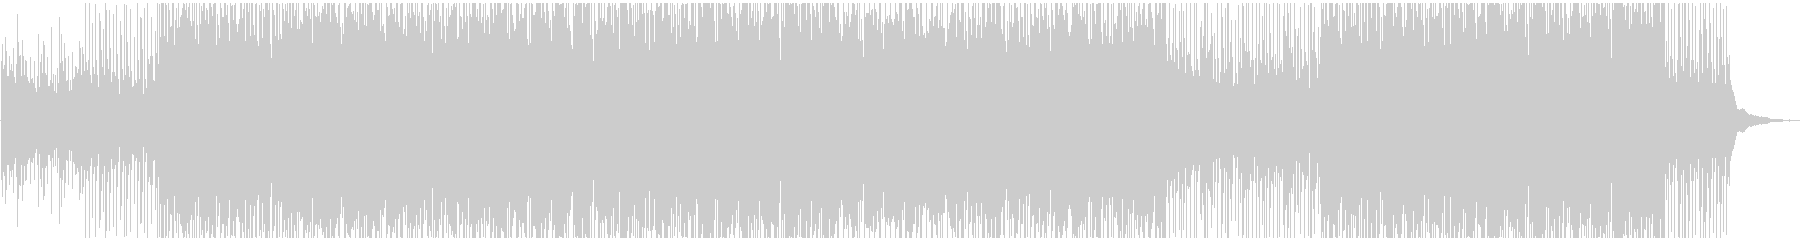 113bpm Sentimental Tropical Piano House's unreproduced waveform